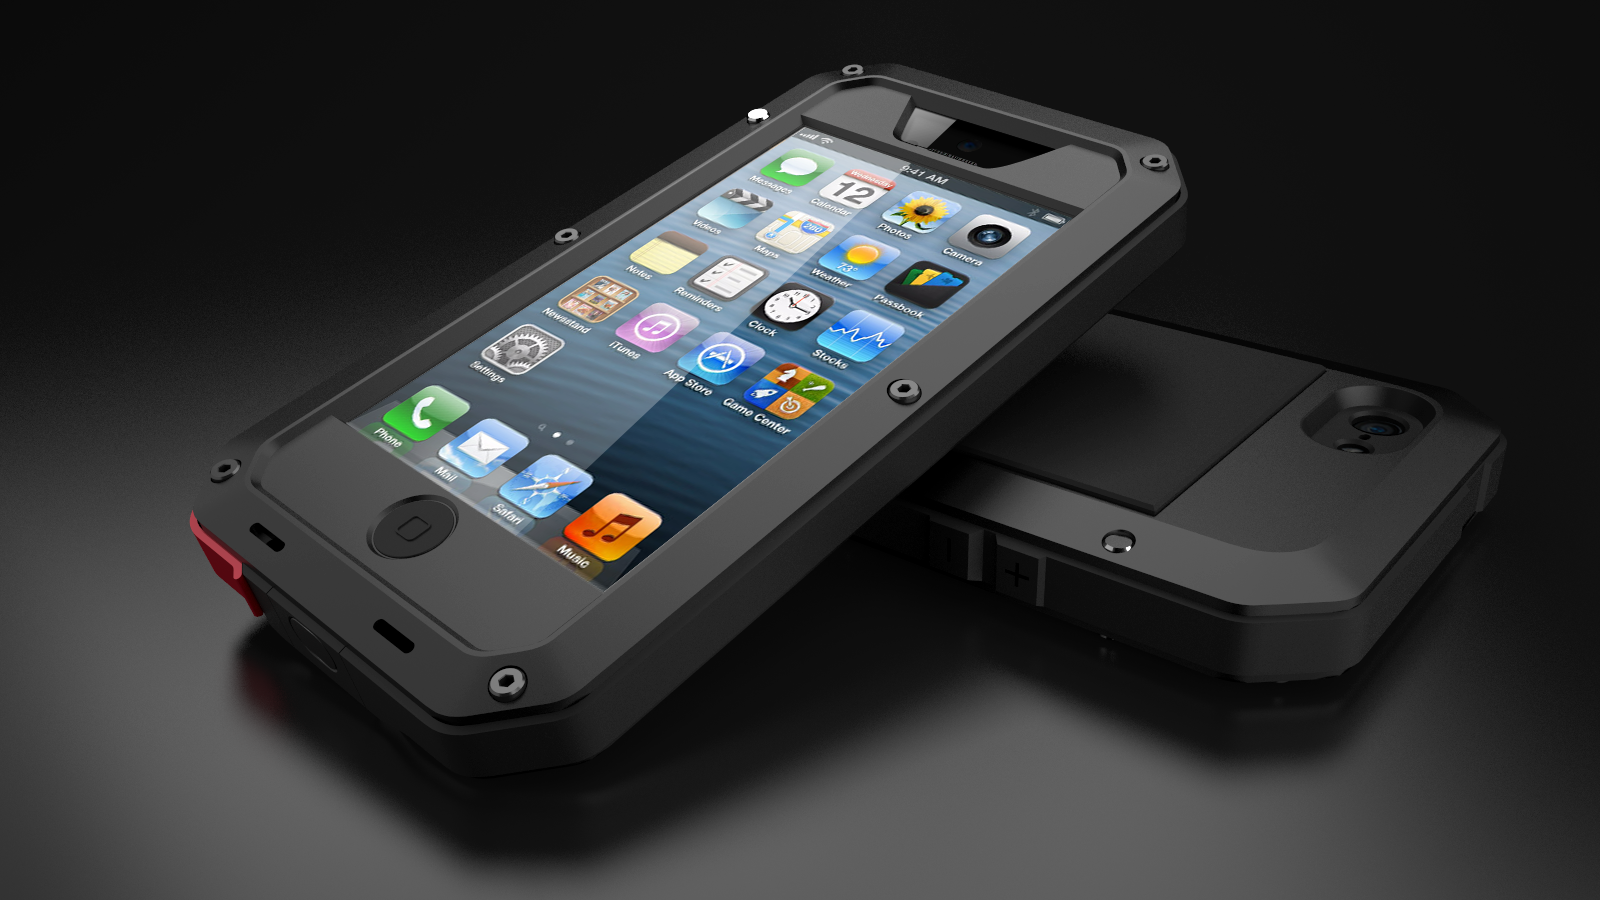 Technology Committee Taktik Iphone 5 Case From Lunatik